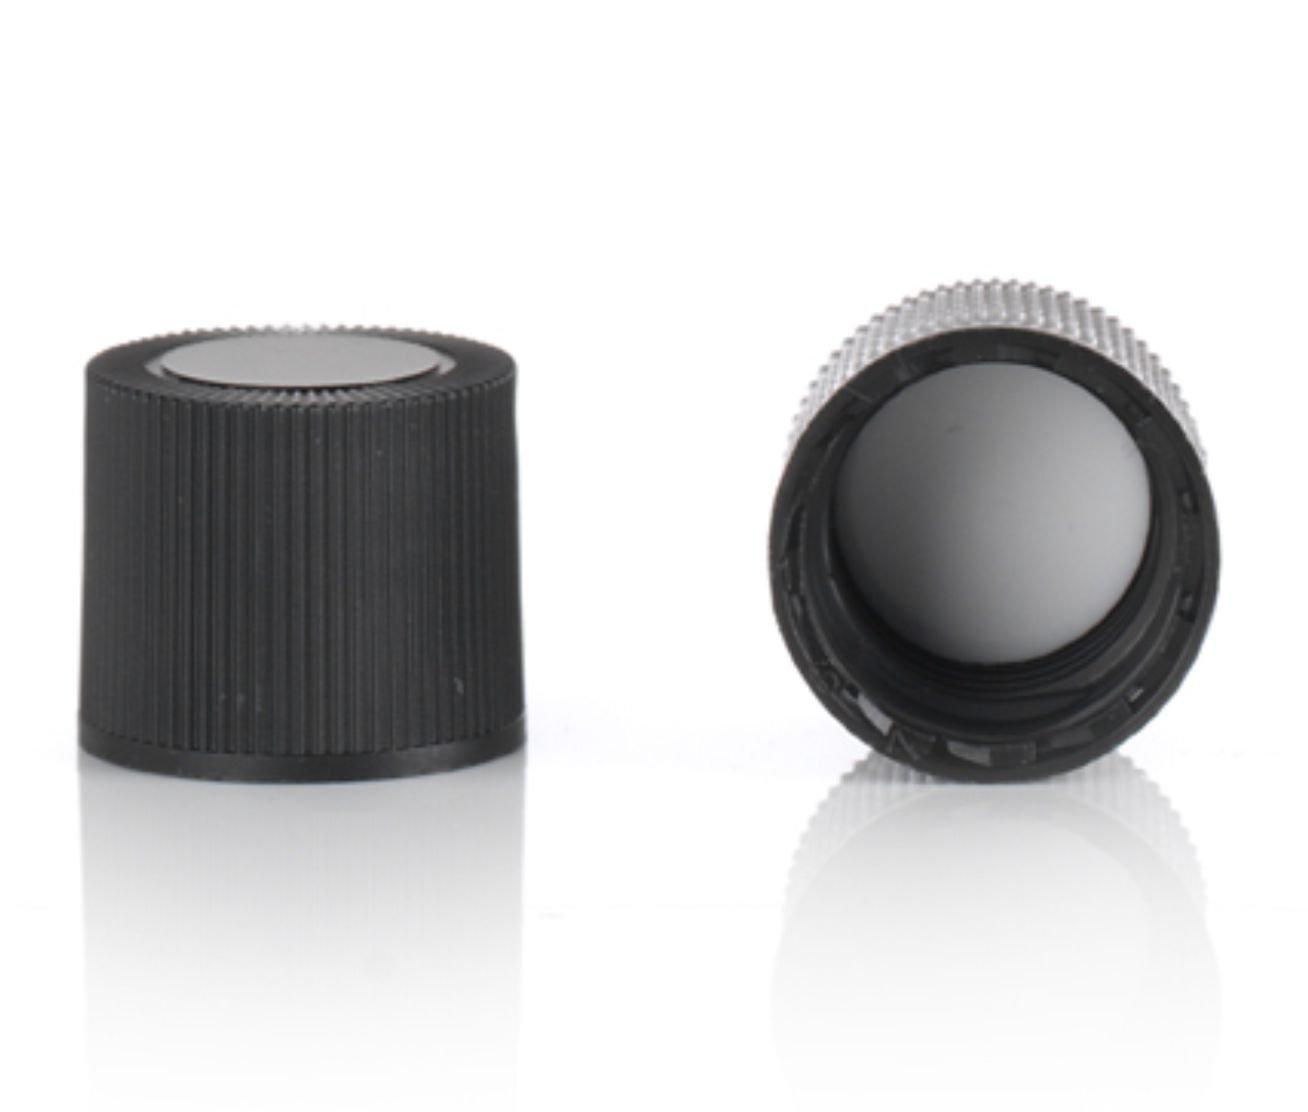 Magnakoys Black 15-415 Continuous Thread Closure w/ 14B Rubber Liner Caps for Vials (15-415, Black, 100)